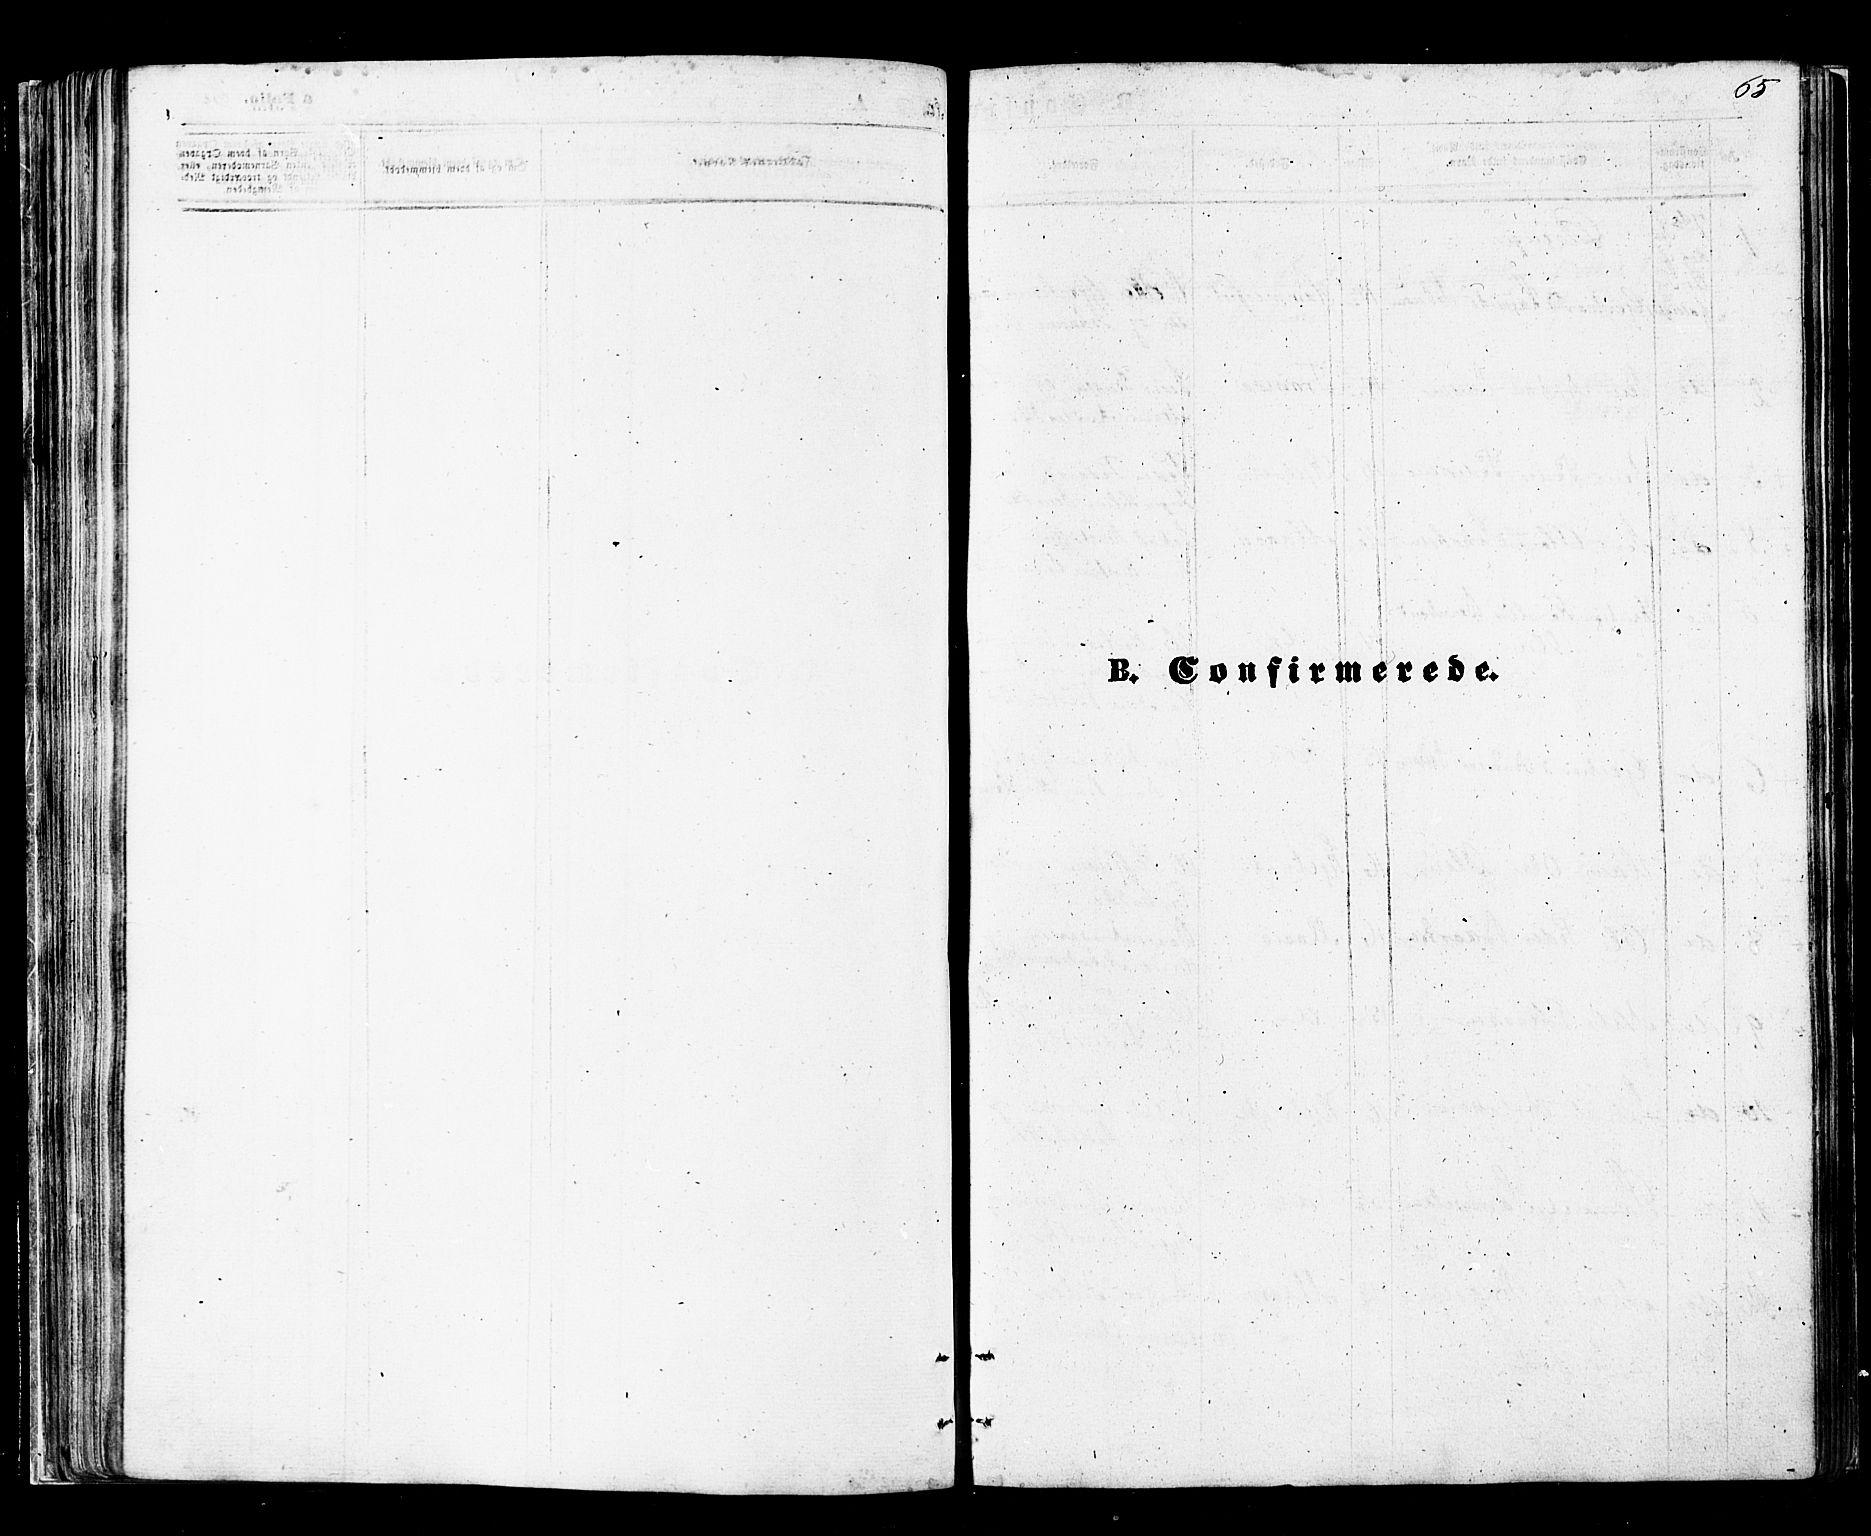 SATØ, Måsøy sokneprestkontor, H/Ha/L0003kirke: Ministerialbok nr. 3, 1866-1877, s. 65